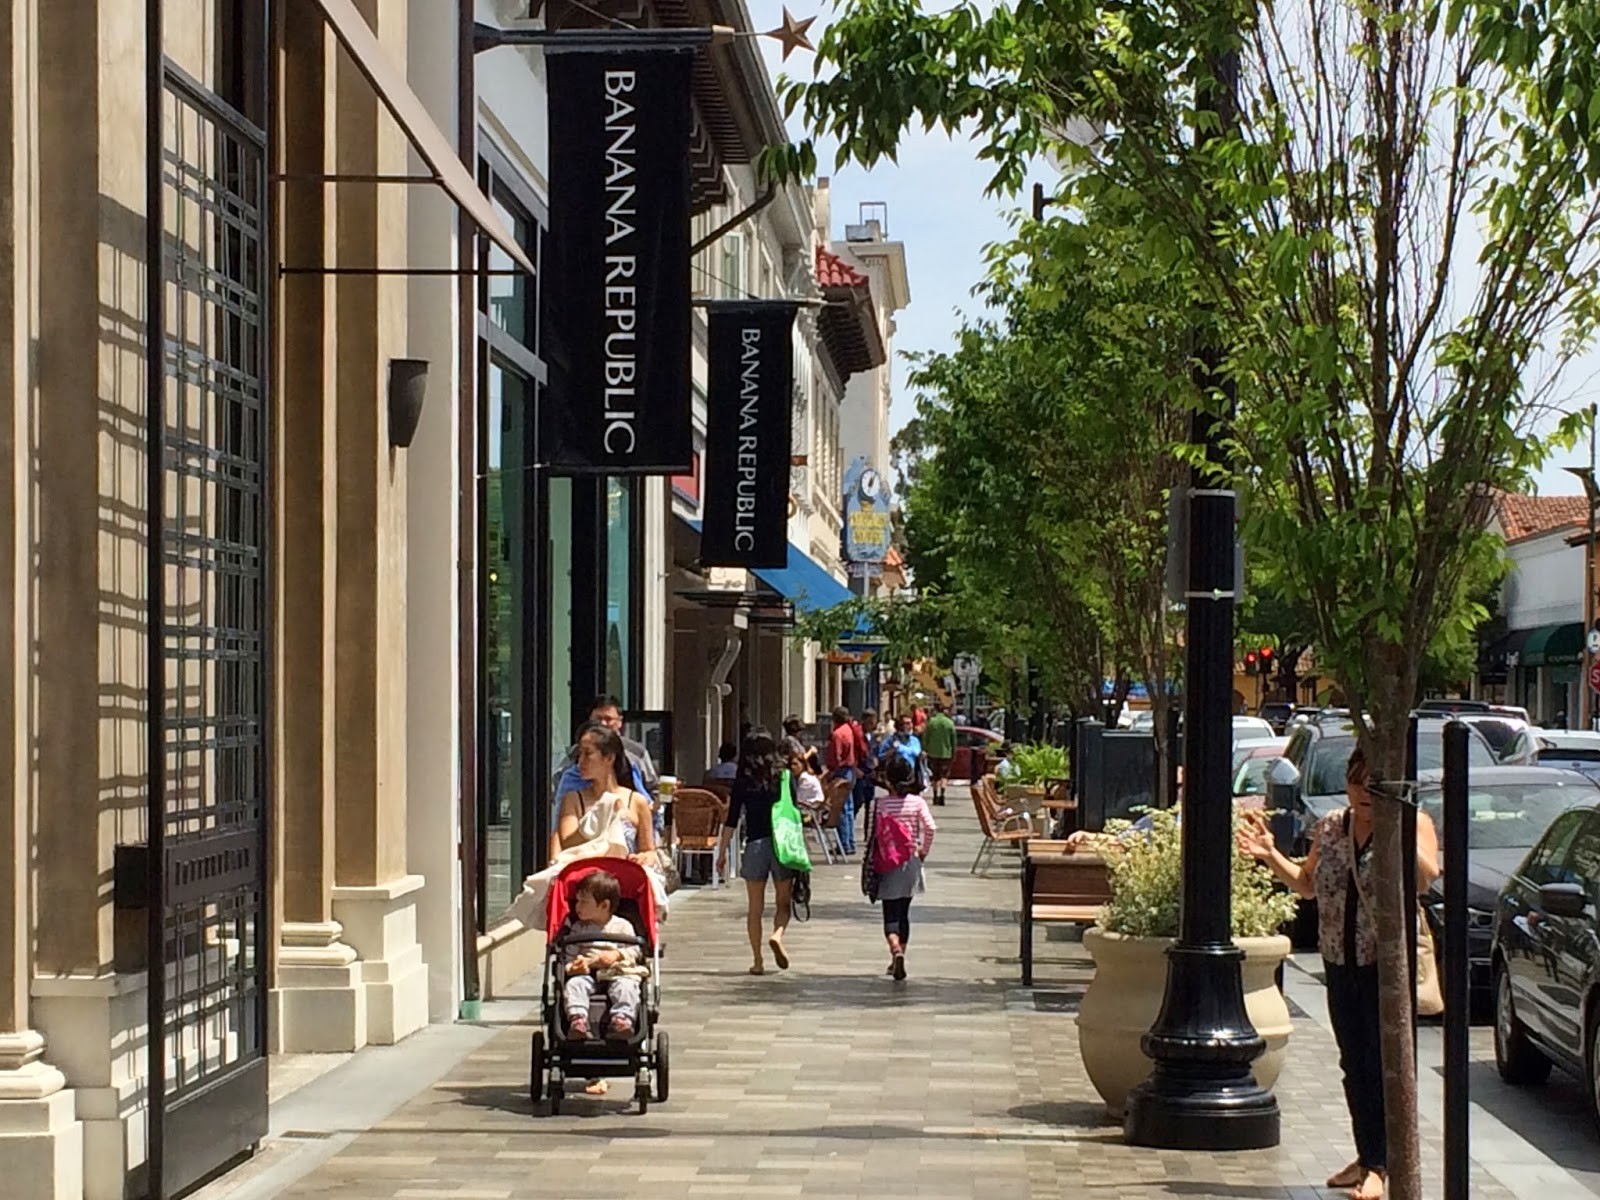 Plannerdan Review A New Streetscape For Burlingame Avenue